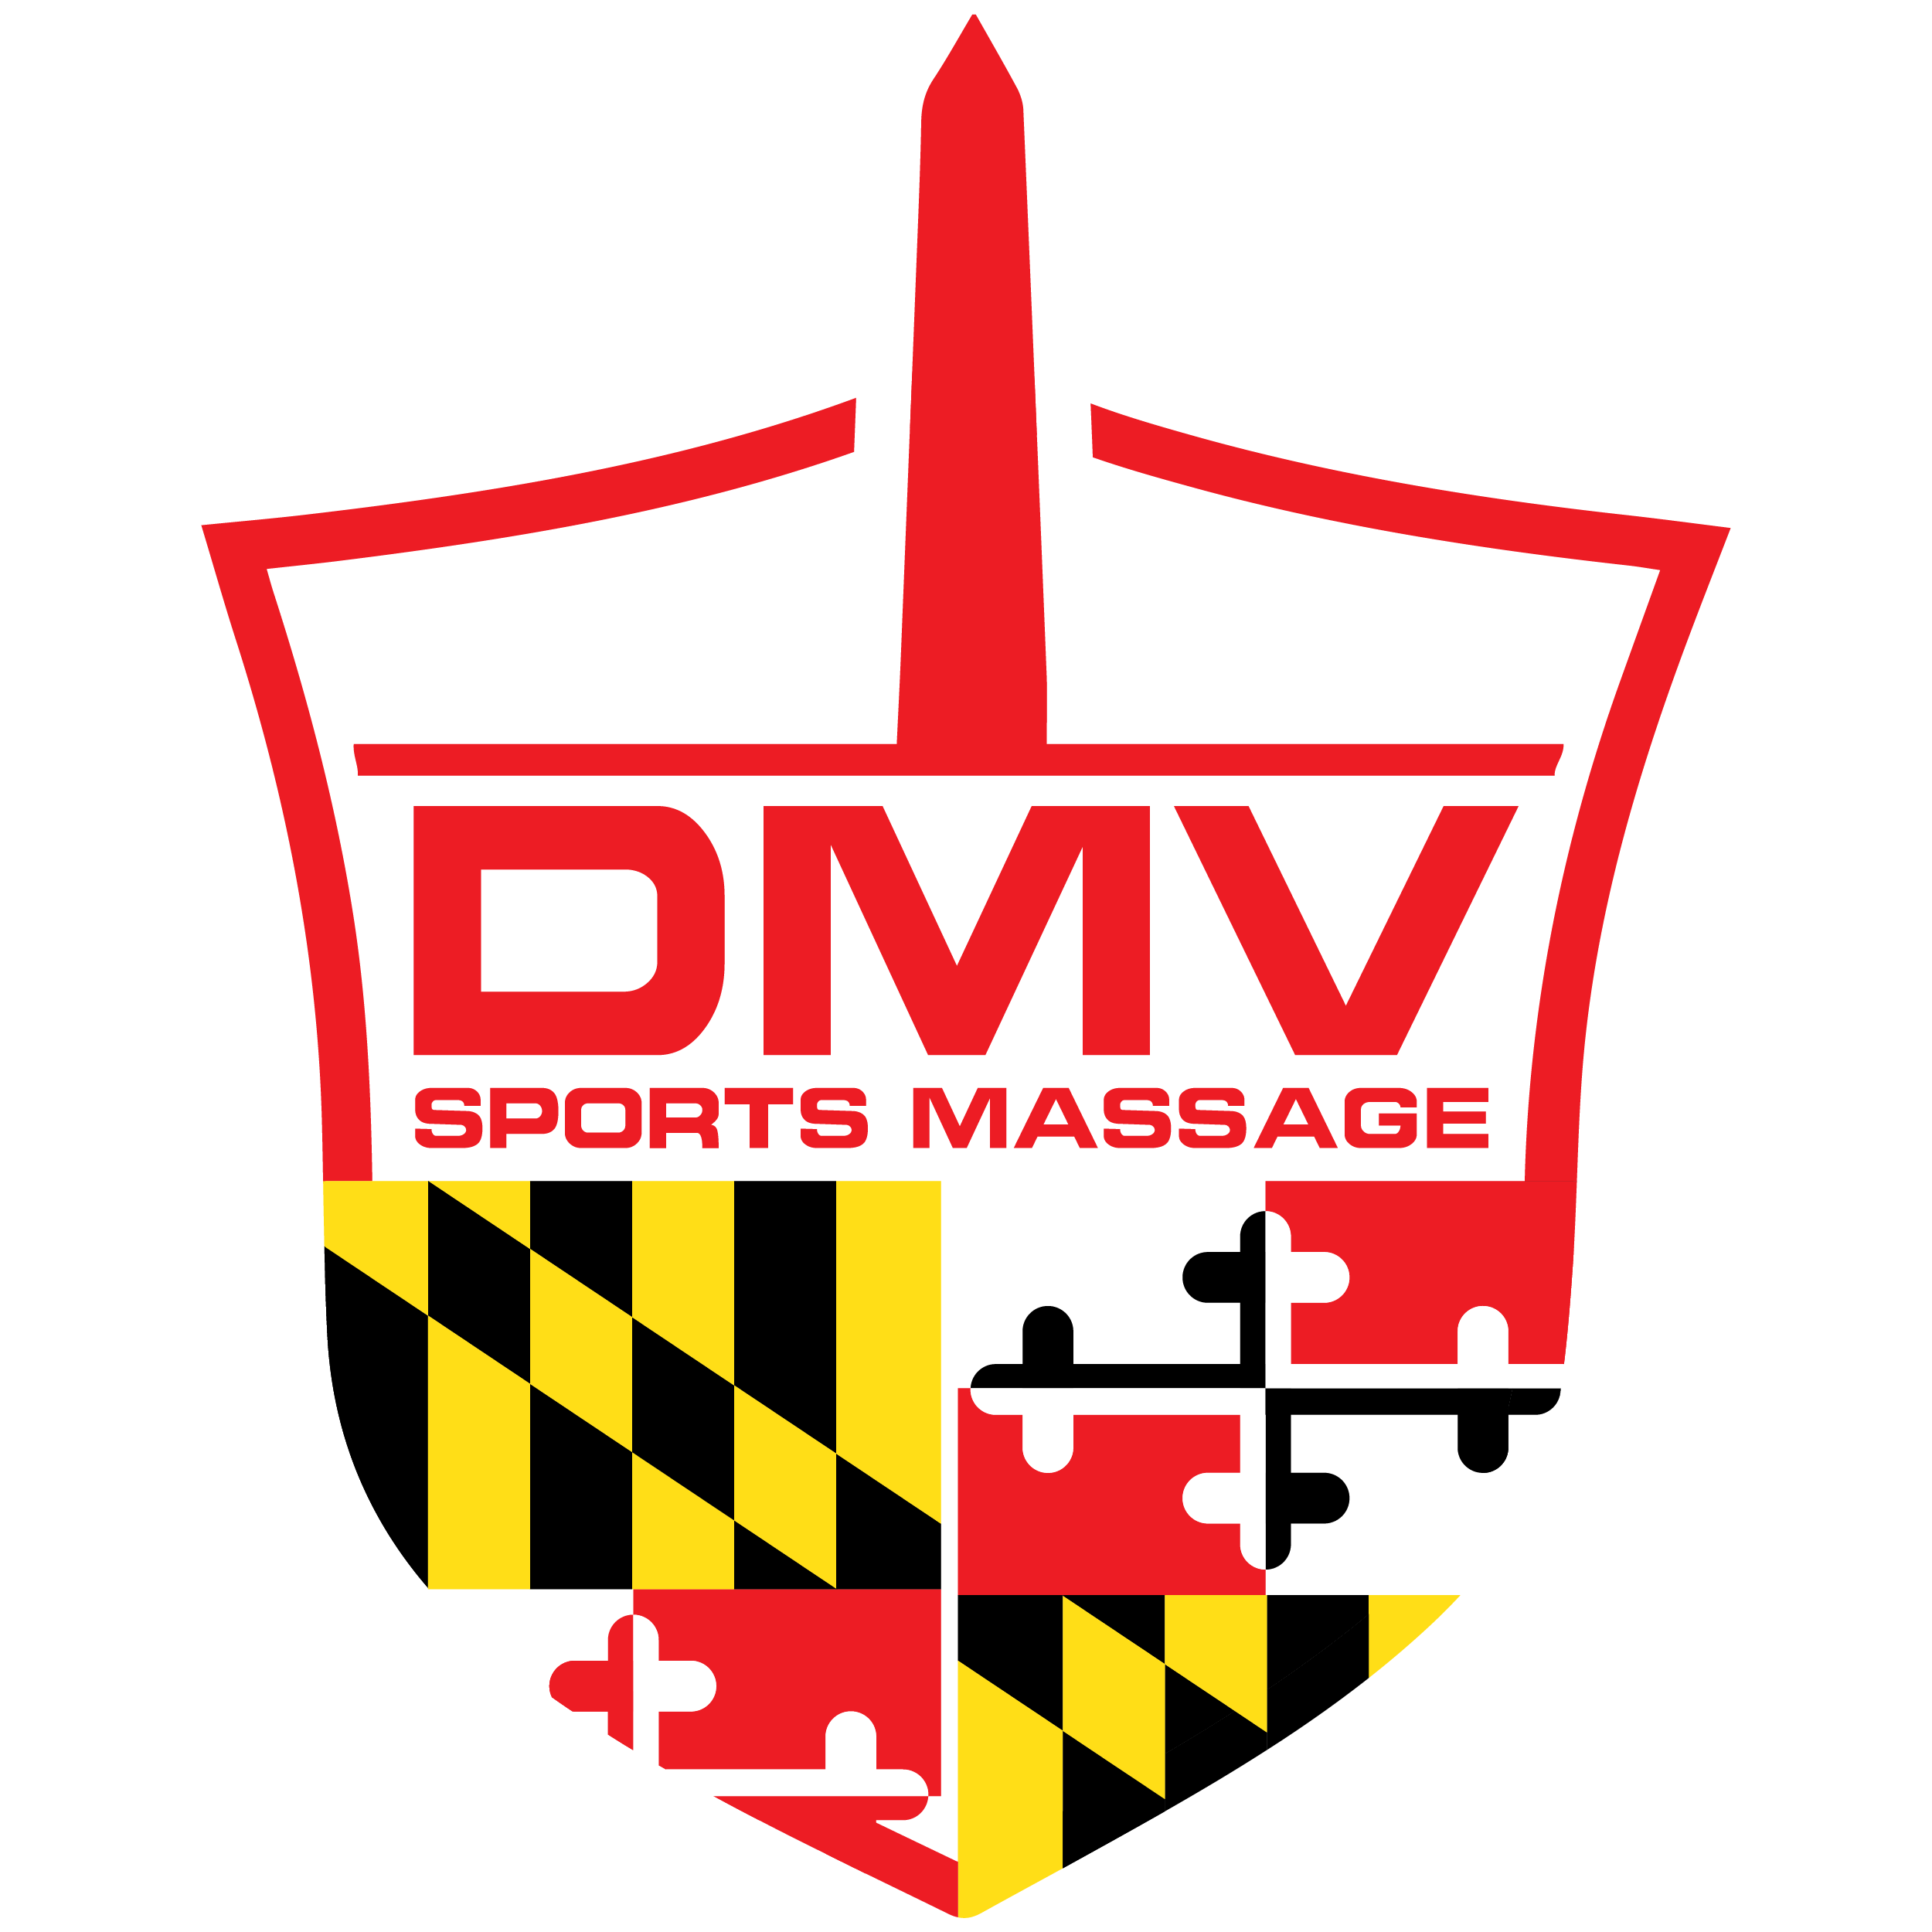 DMV Sports Massage